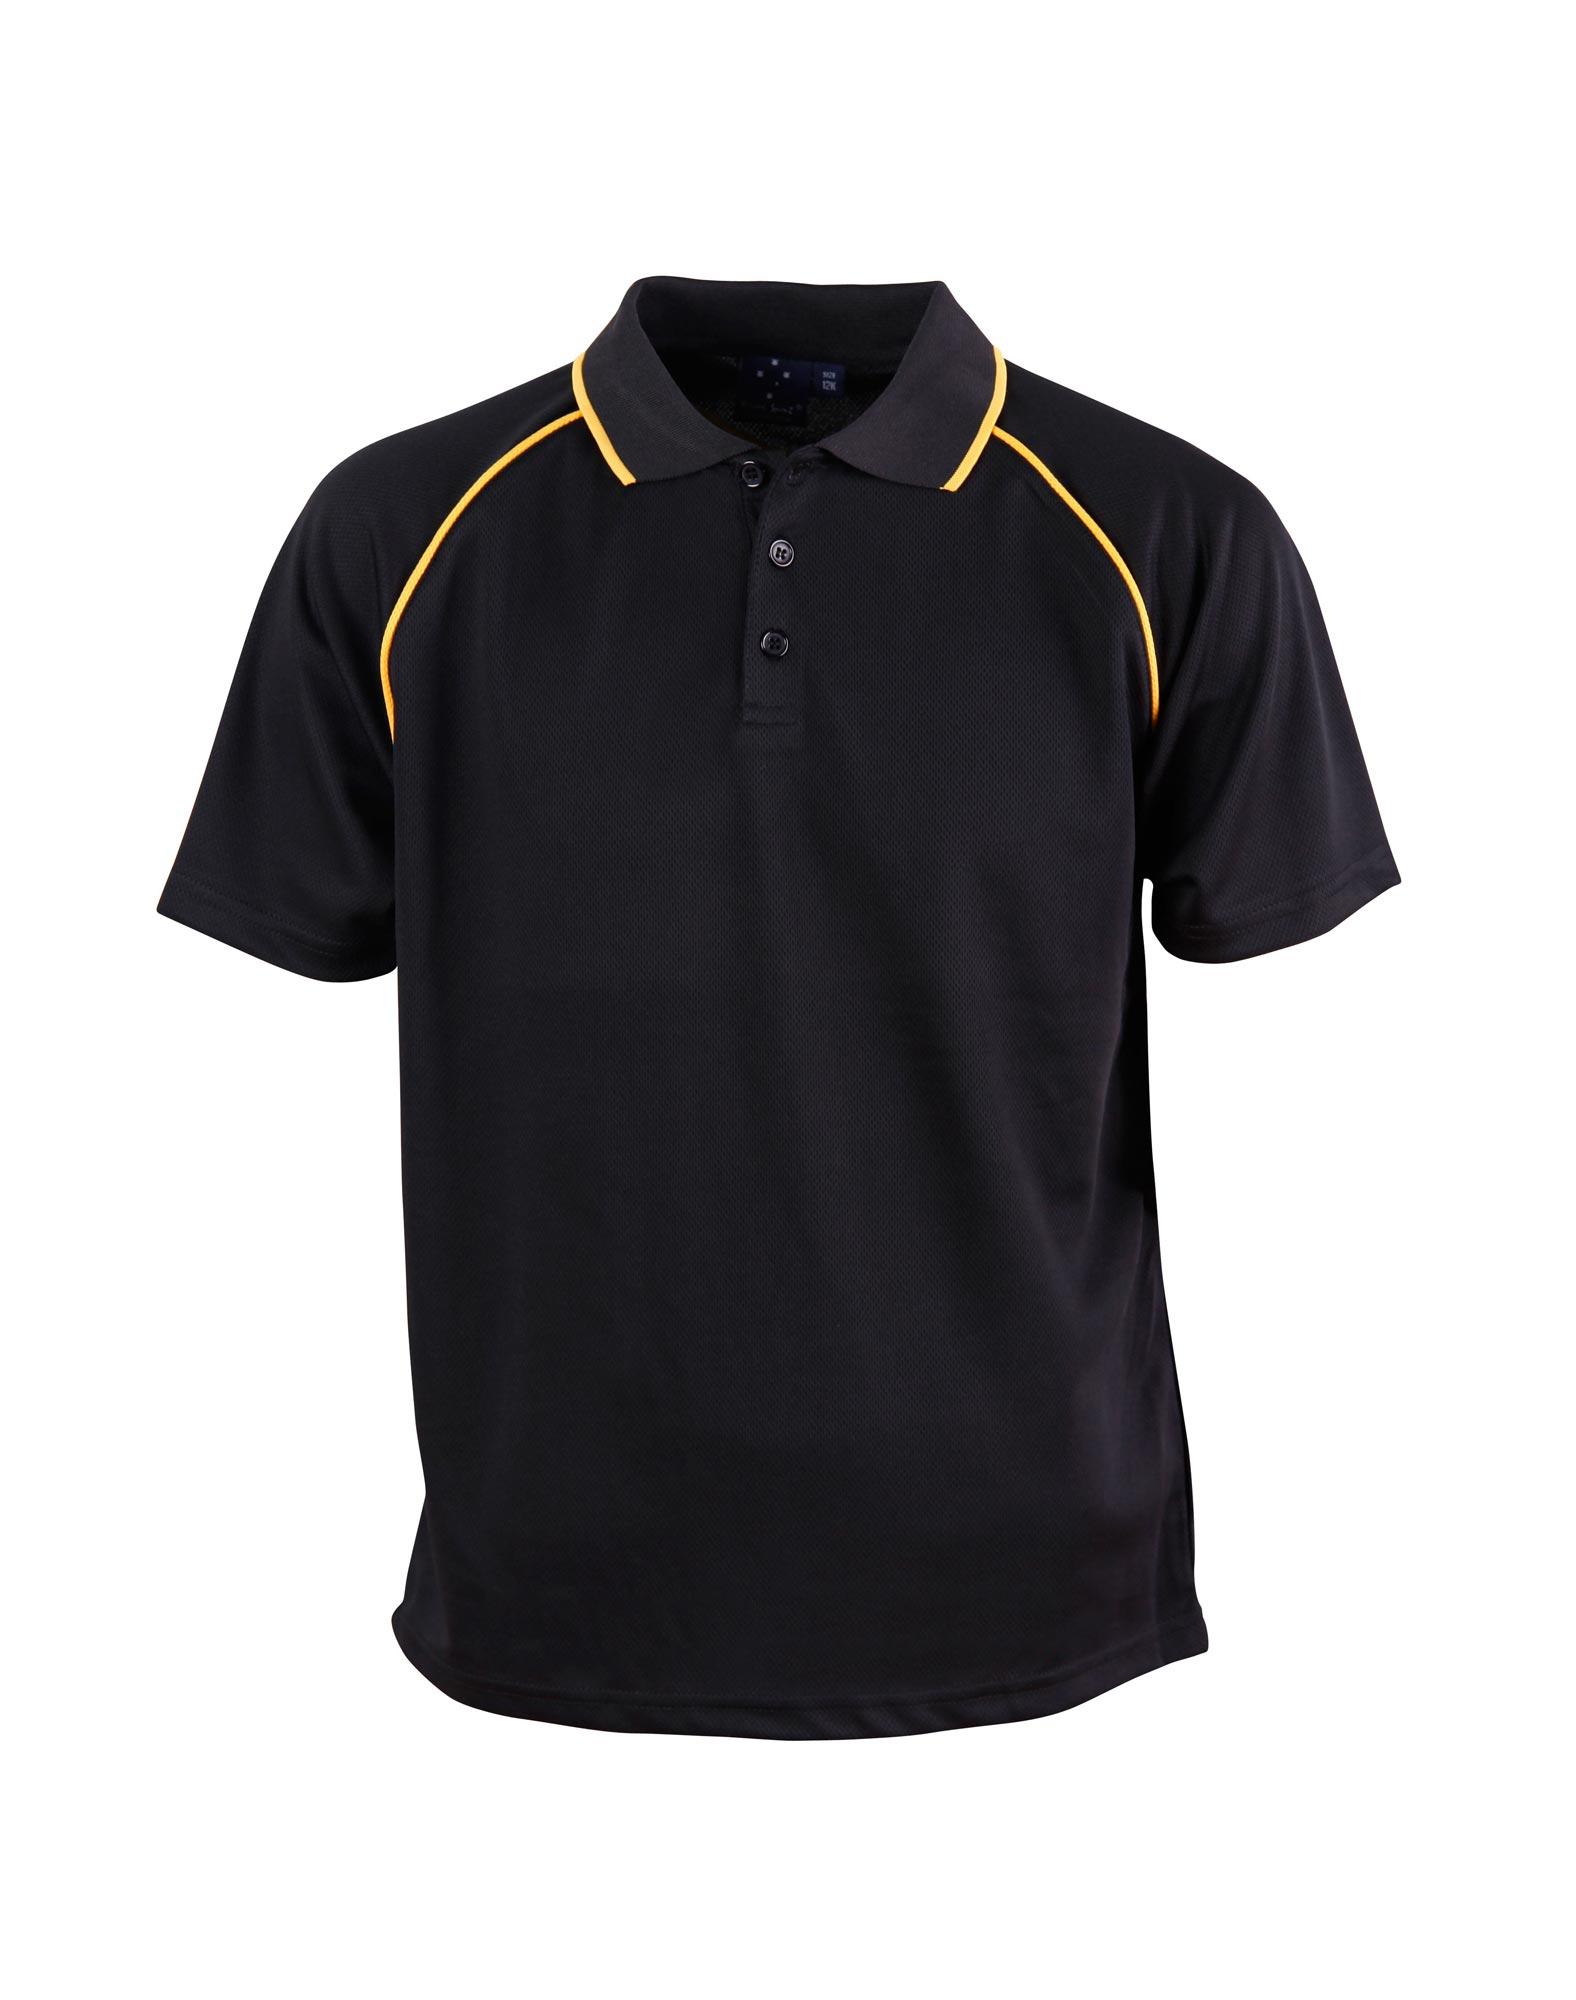 Black.Gold